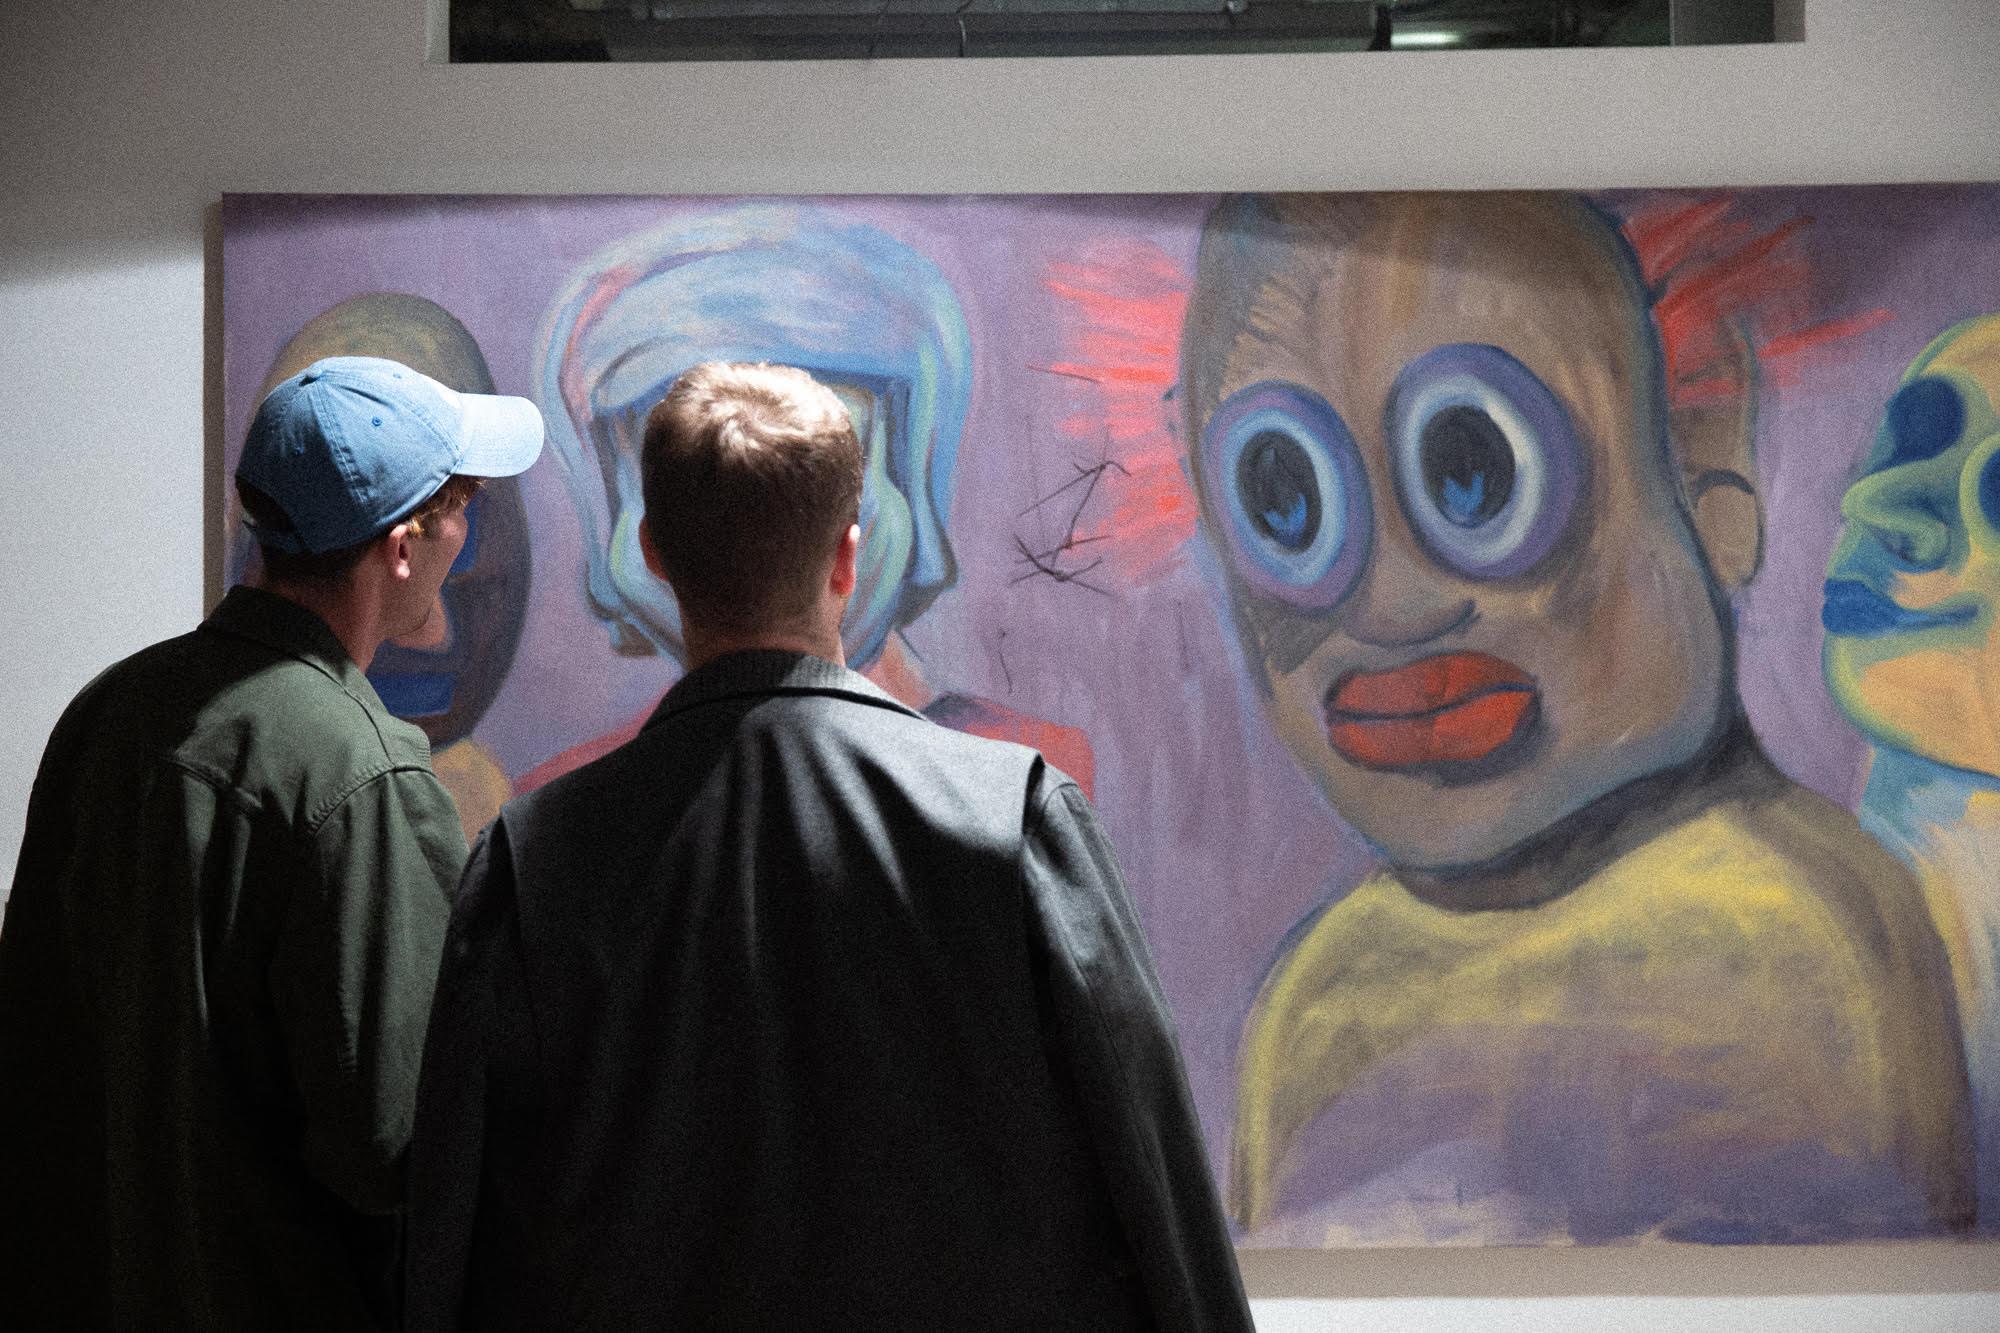 Ria Kacharava 5 #art живопись, искусство, Нью-Йорк, Риа Качарава, сша